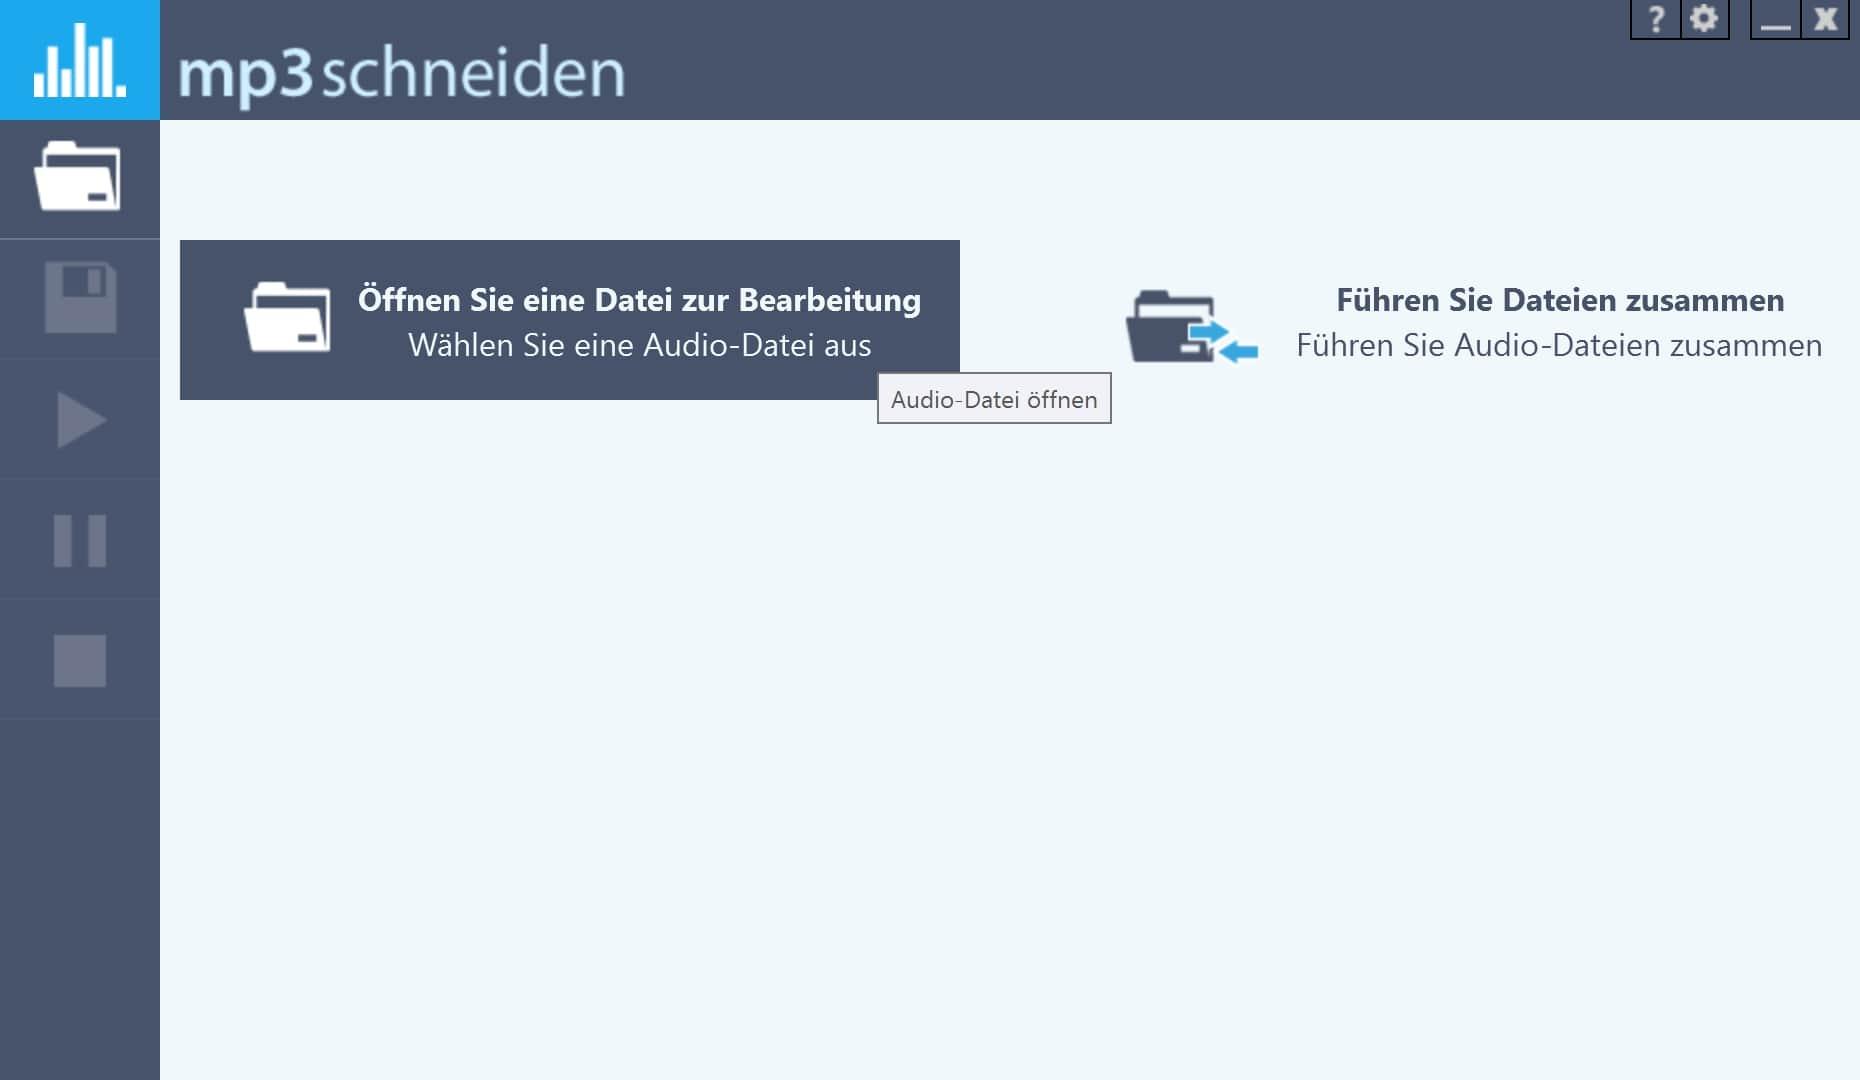 MP3 kürzen - MP3 Datei öffnen